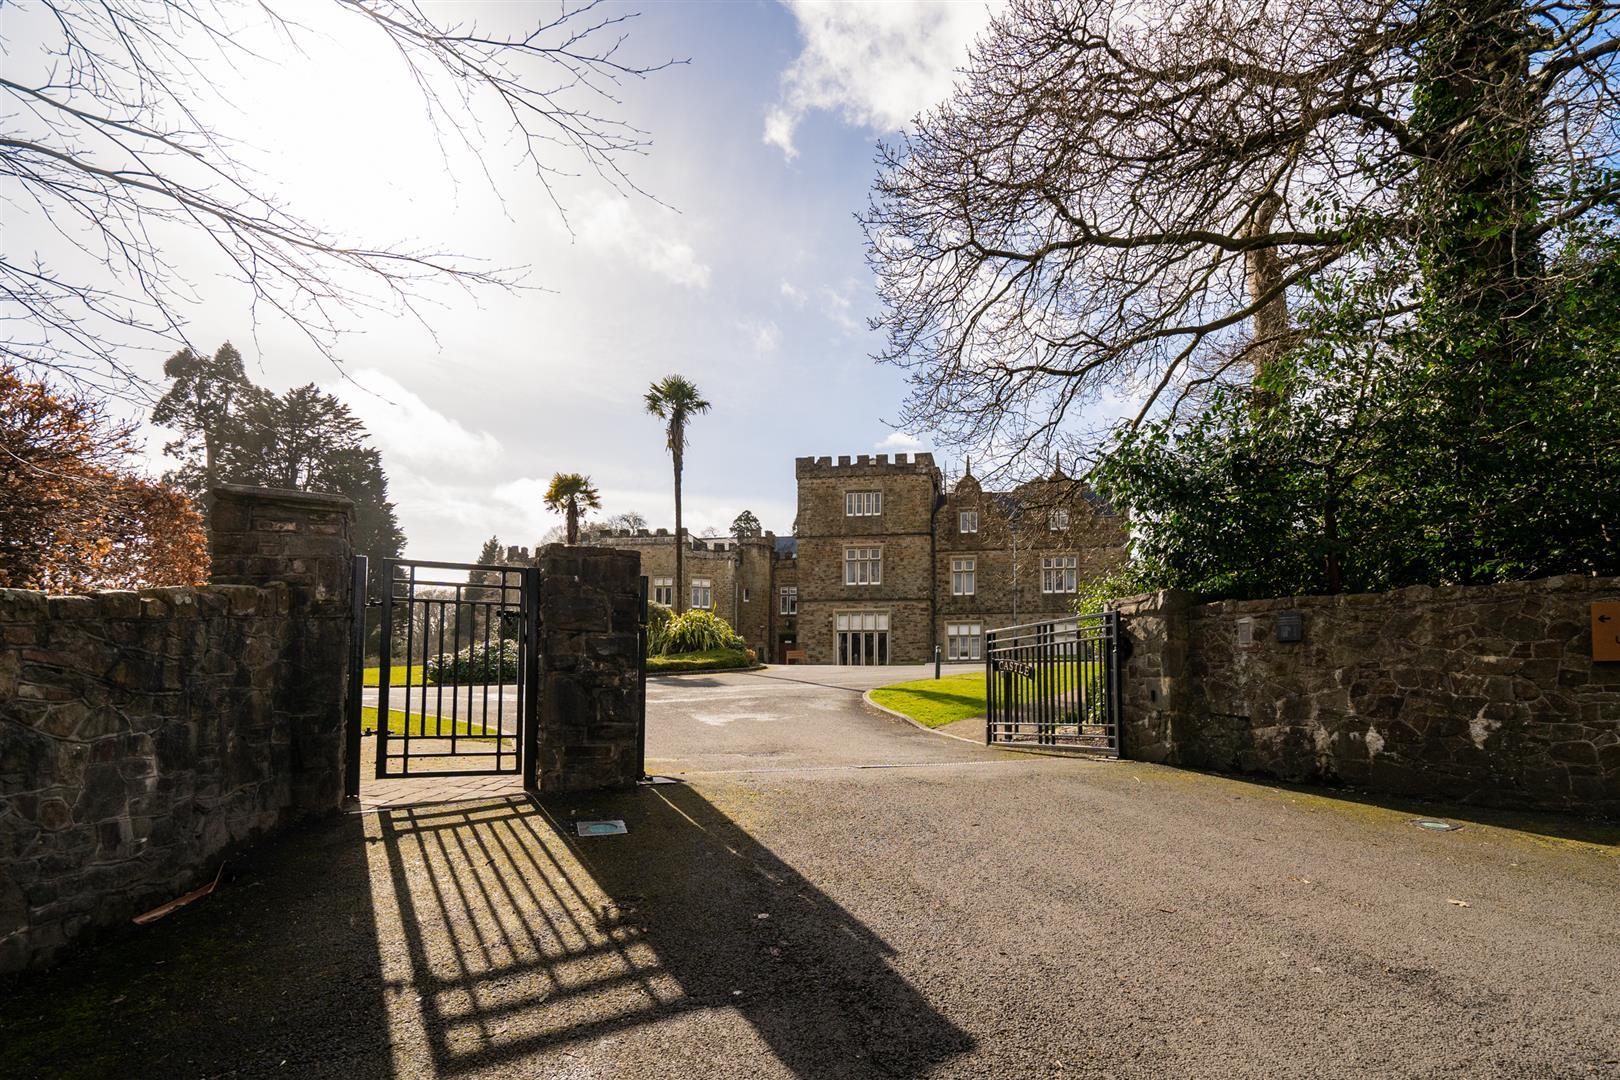 The Coach House, Castle View, Swansea, SA3 5BZ